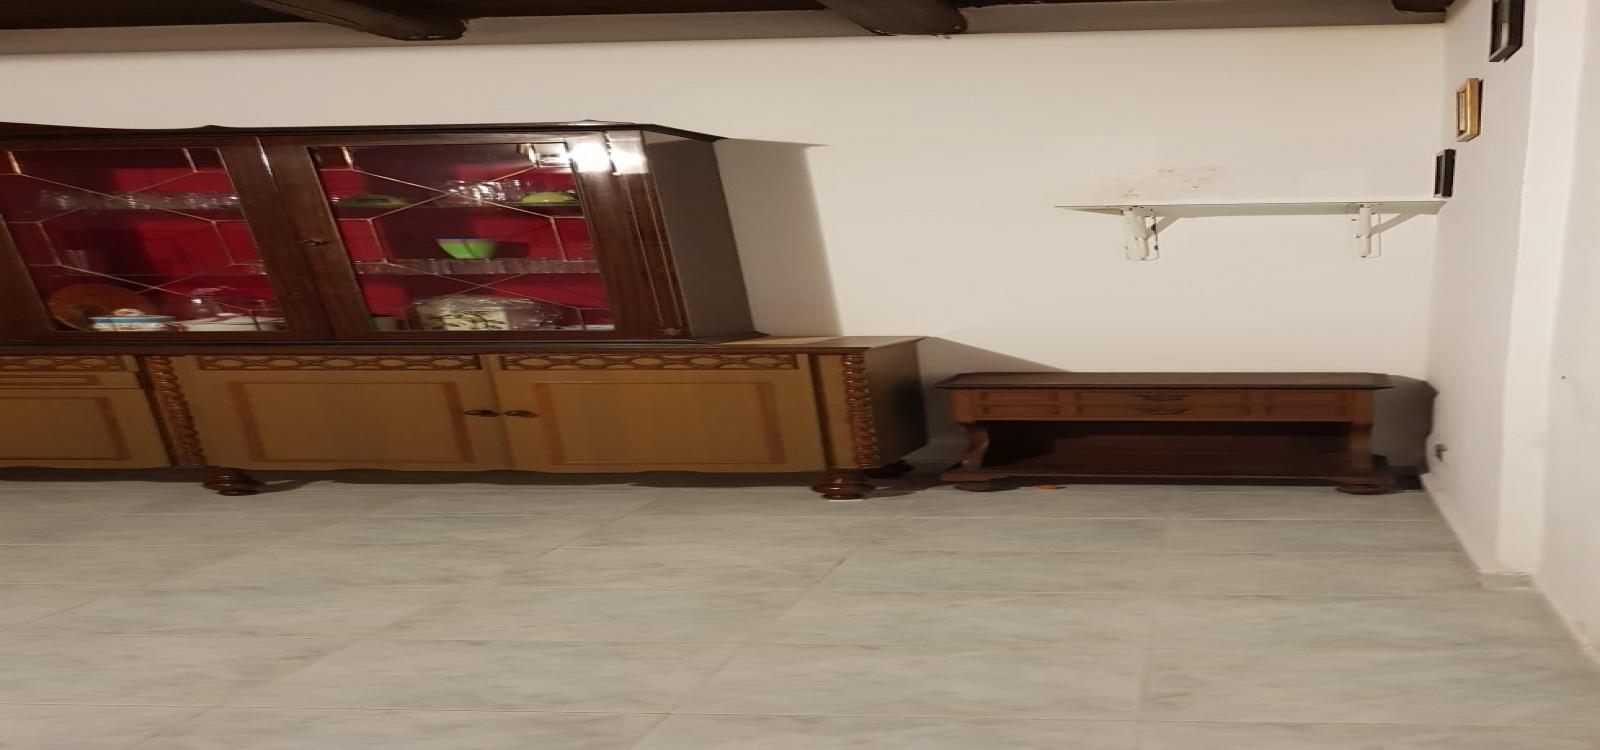 BORGATA,SIRACUSA,Appartamento,BORGATA,2146